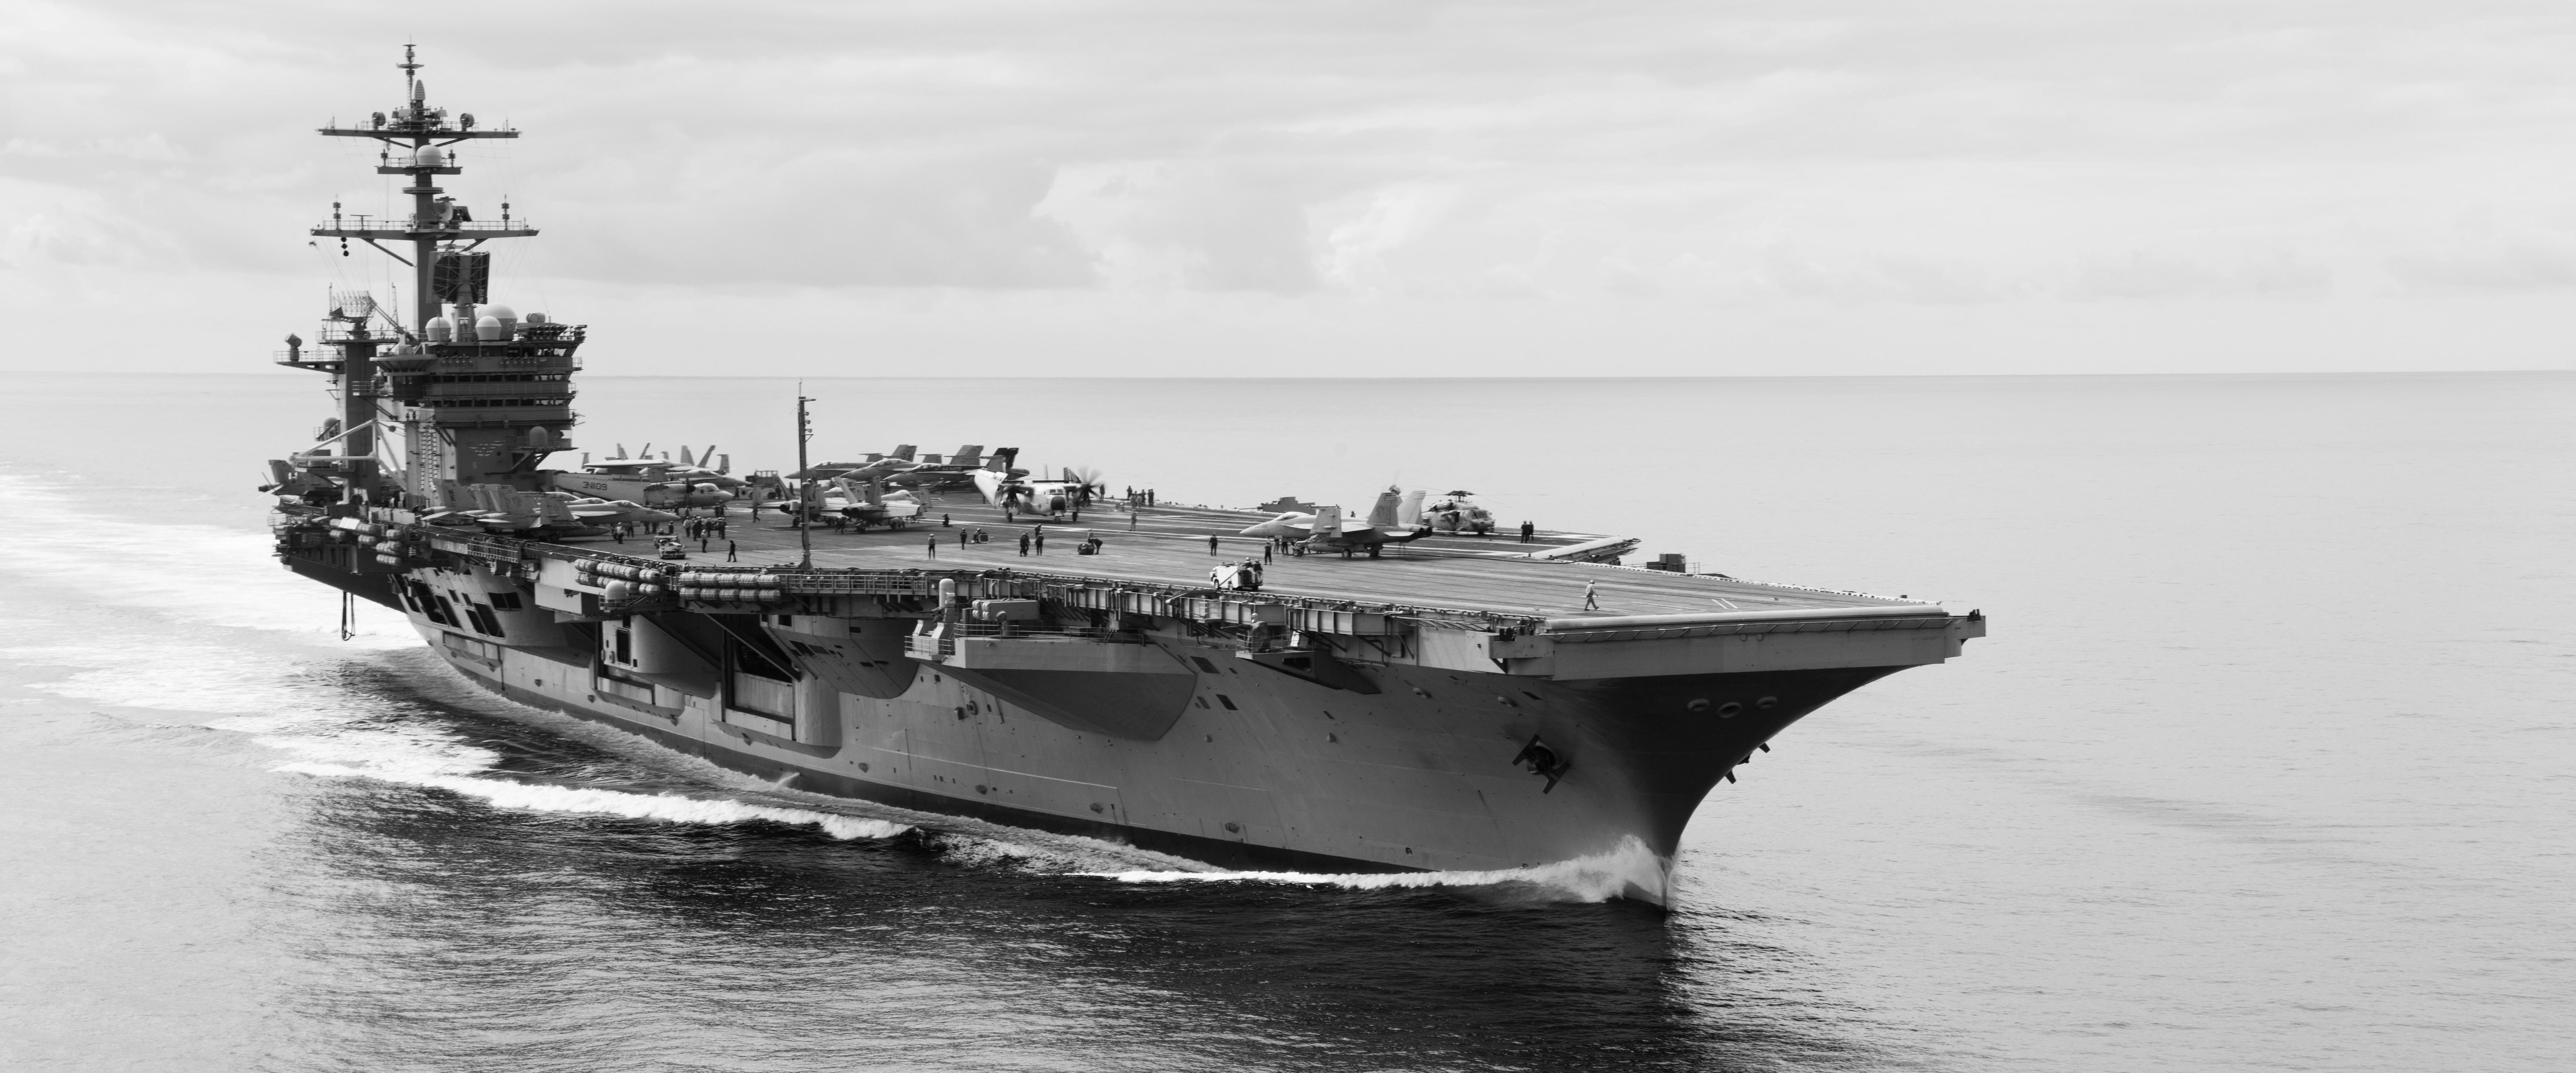 CV & CVN : Aircraft Carriers - Porte-avions - Page 26 30690472517_25475962c6_o